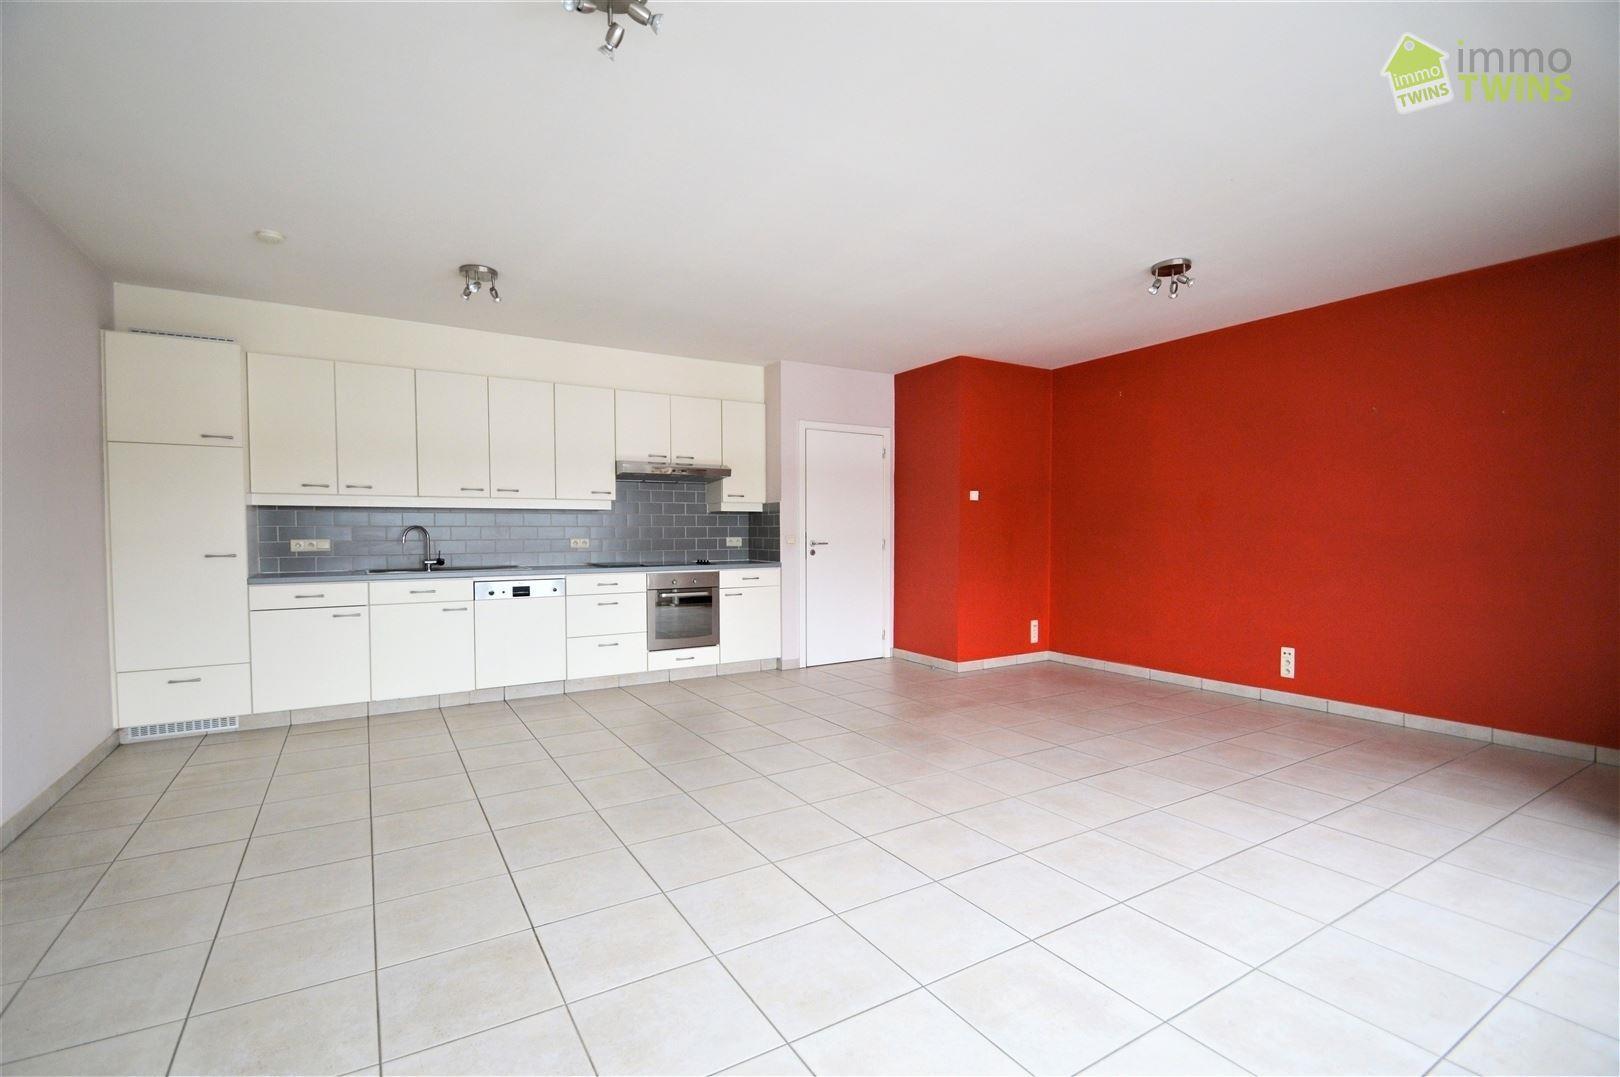 Foto 3 : Appartement te 9200 DENDERMONDE (België) - Prijs € 590